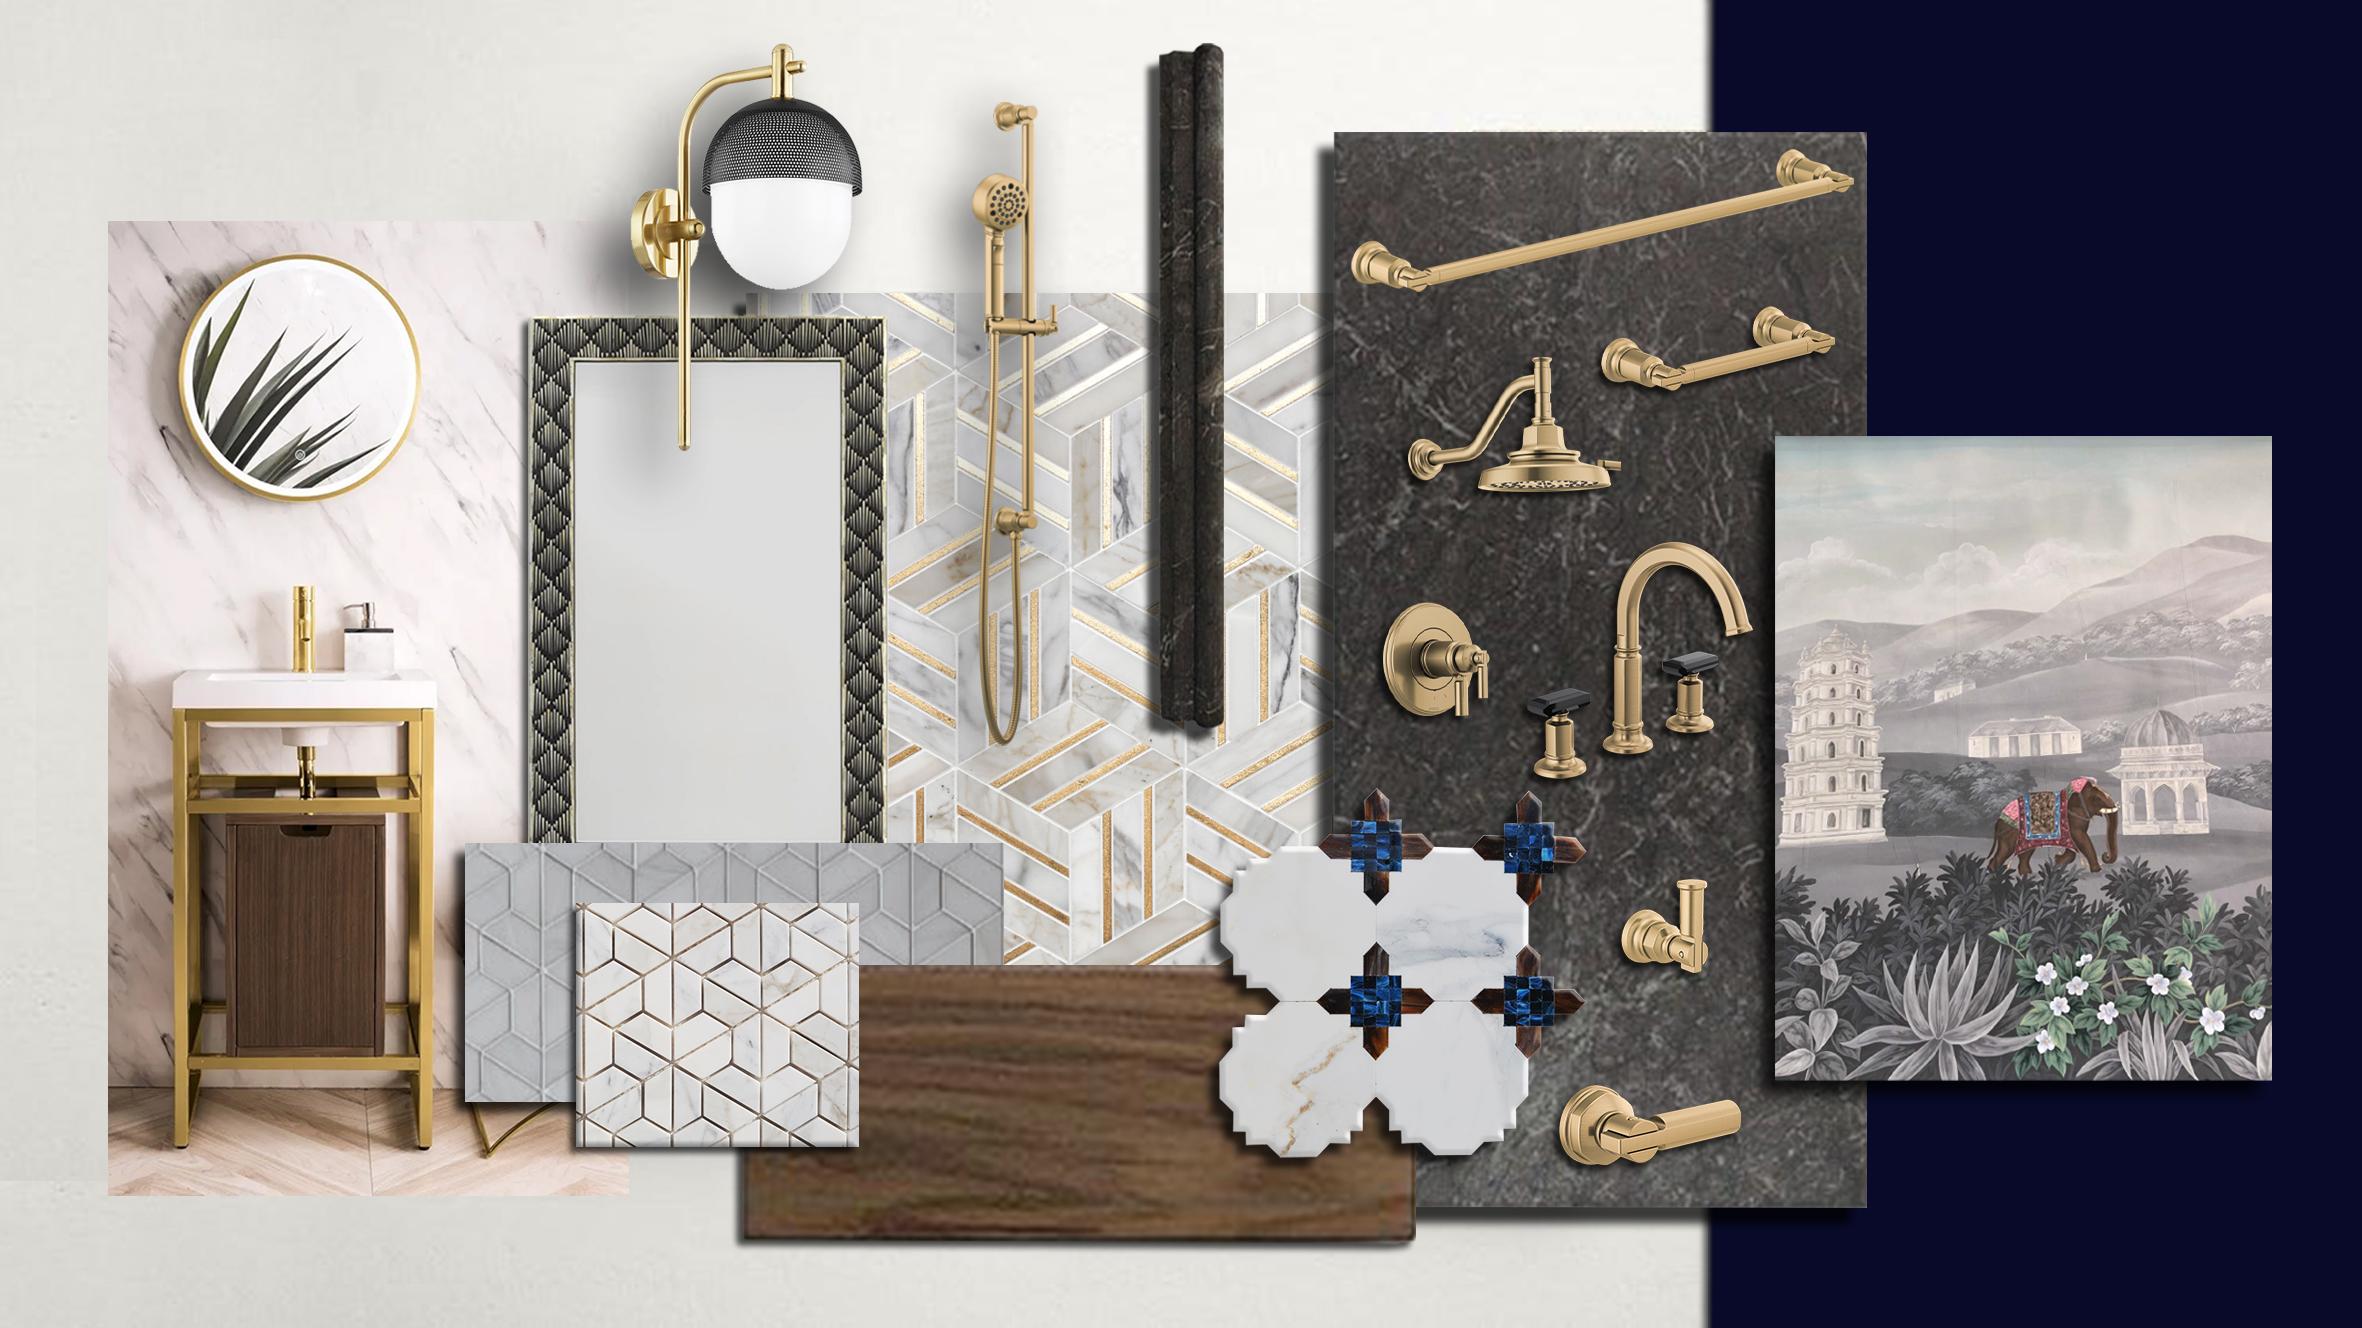 rterior-studio-downtown-la-Kaleidoscope-Project-bathroom-moodboard